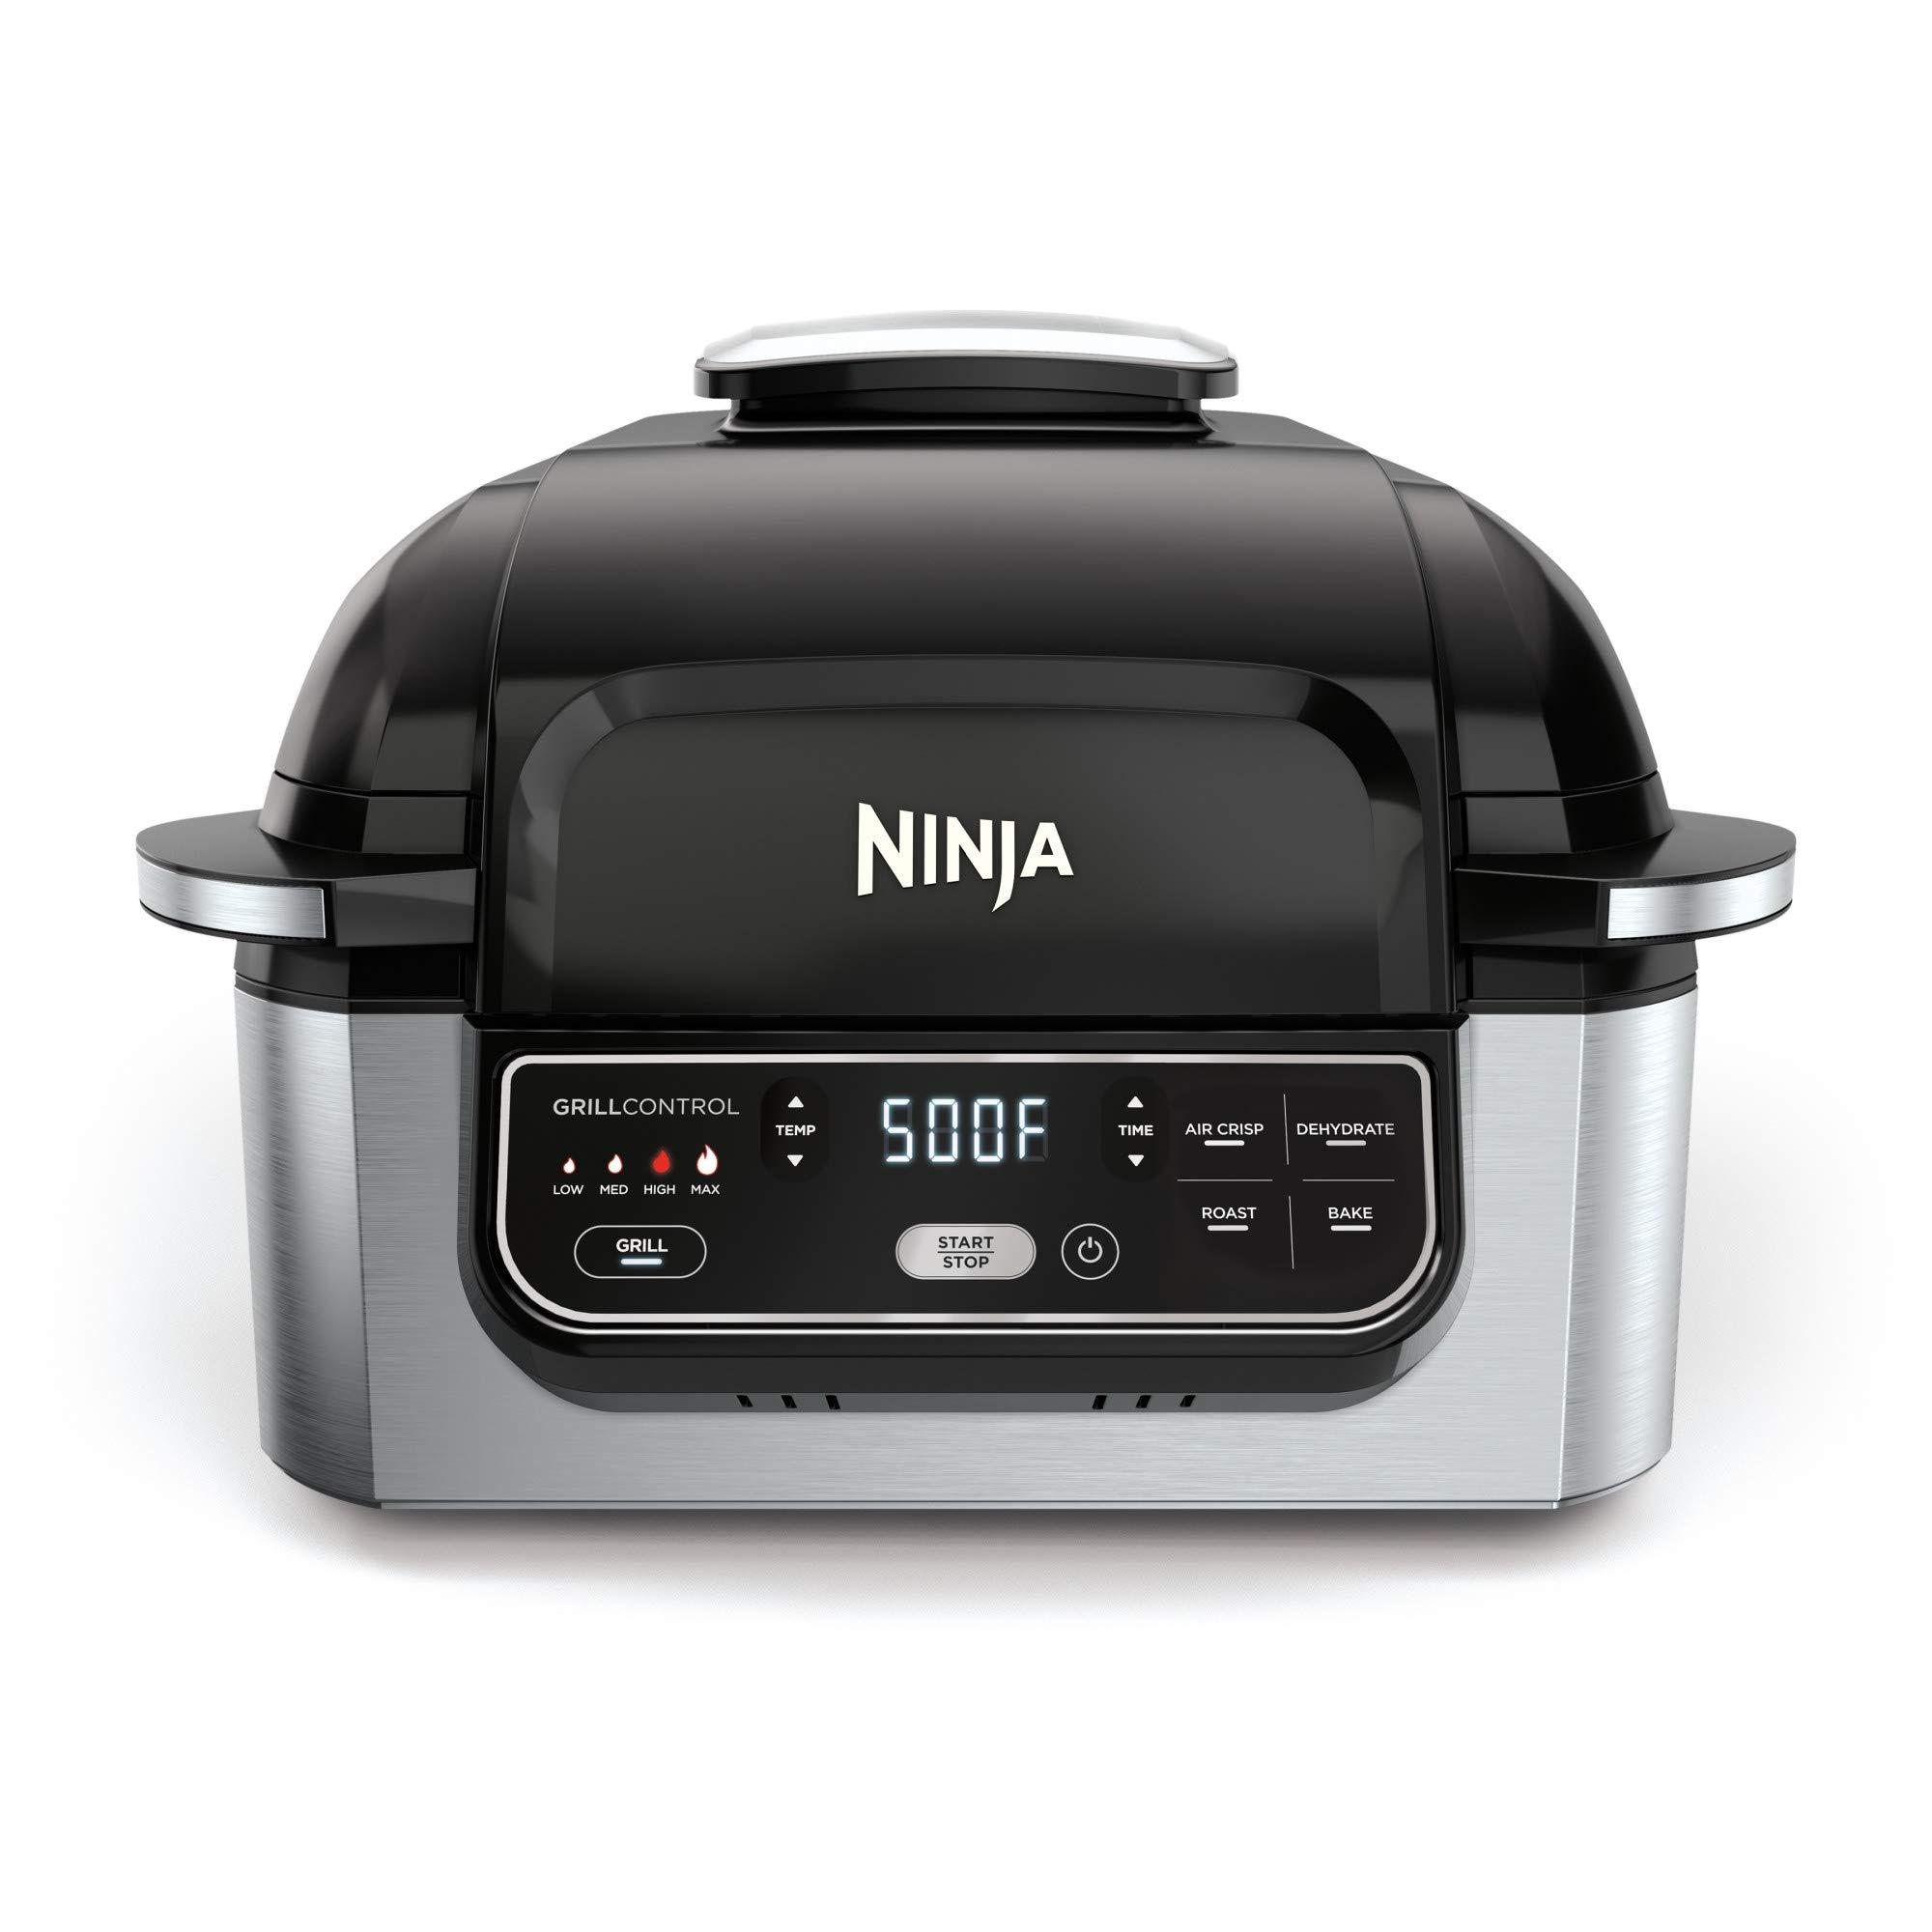 Ninja Dehydrate Indoor Electric AG301